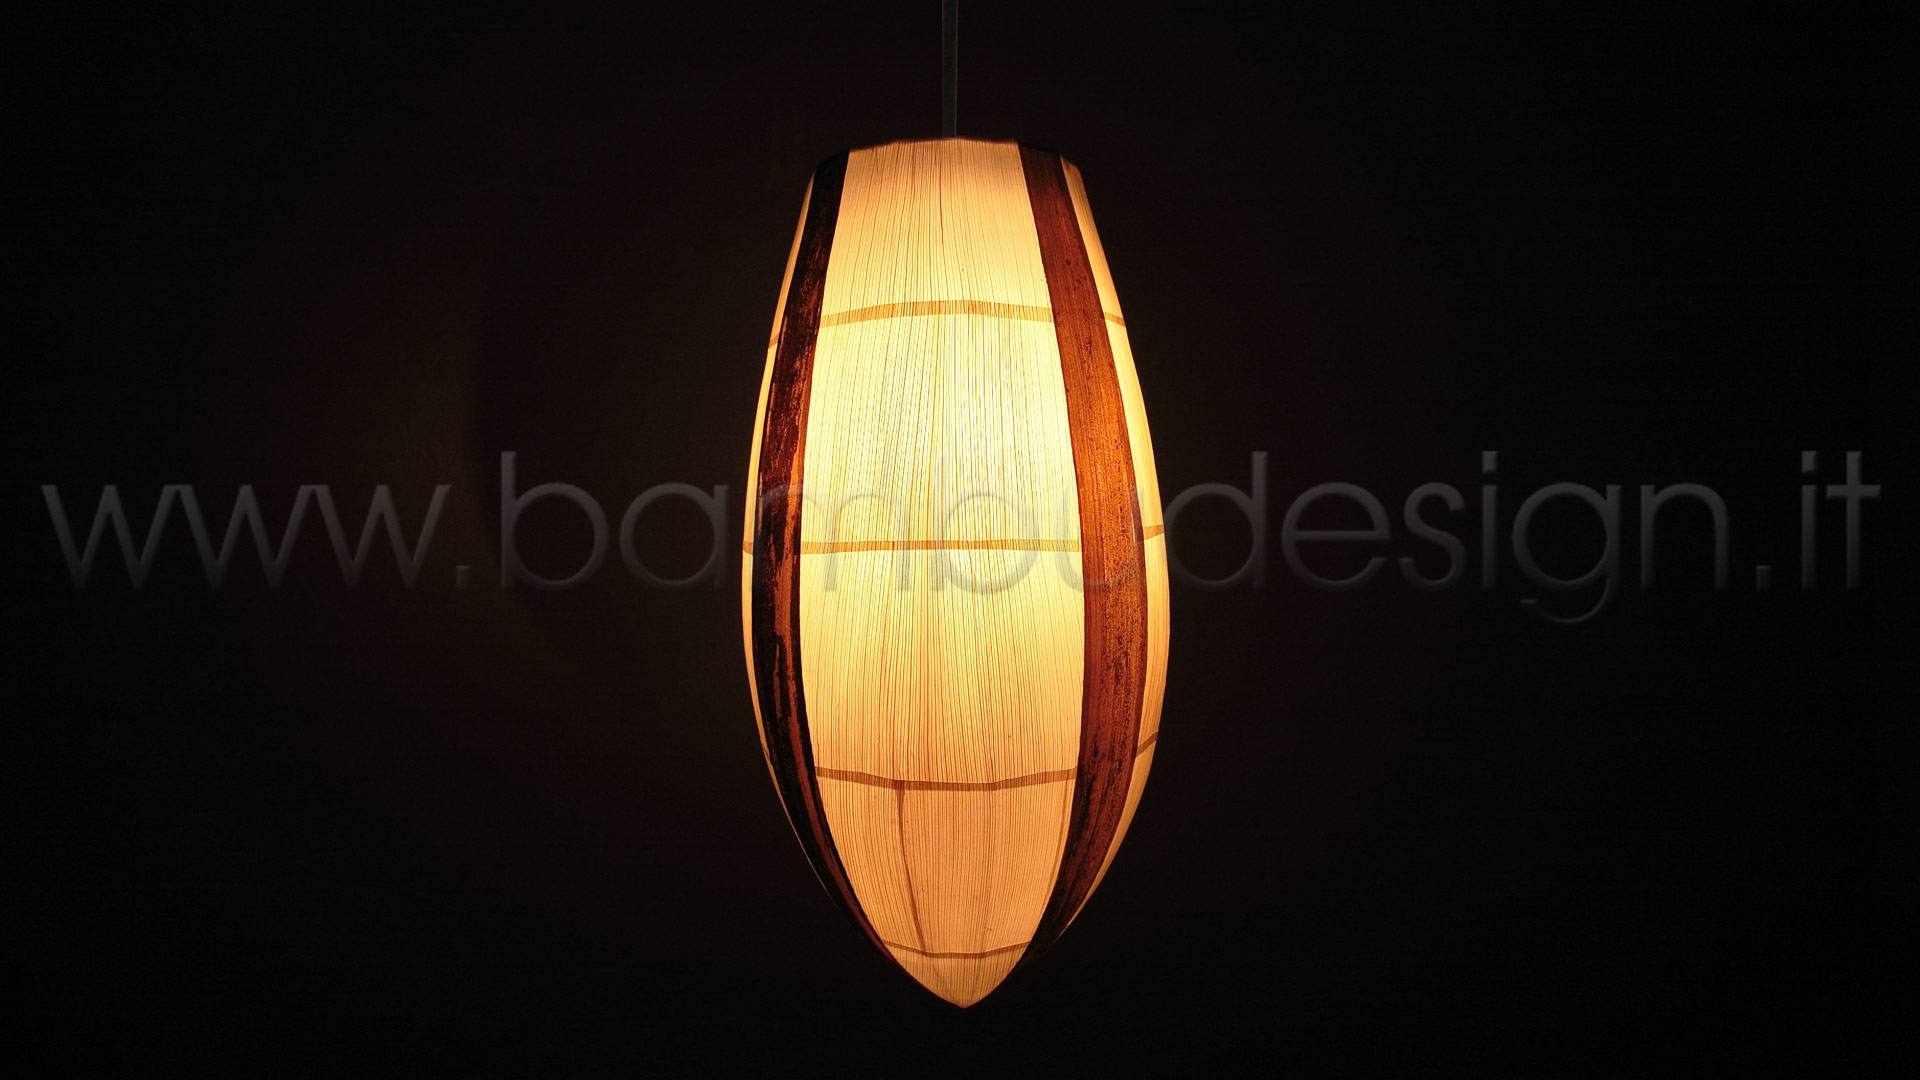 Moon Lampada H45 Singola Mais E T Banano Diam20 Sospensione Kc3Tl1JF